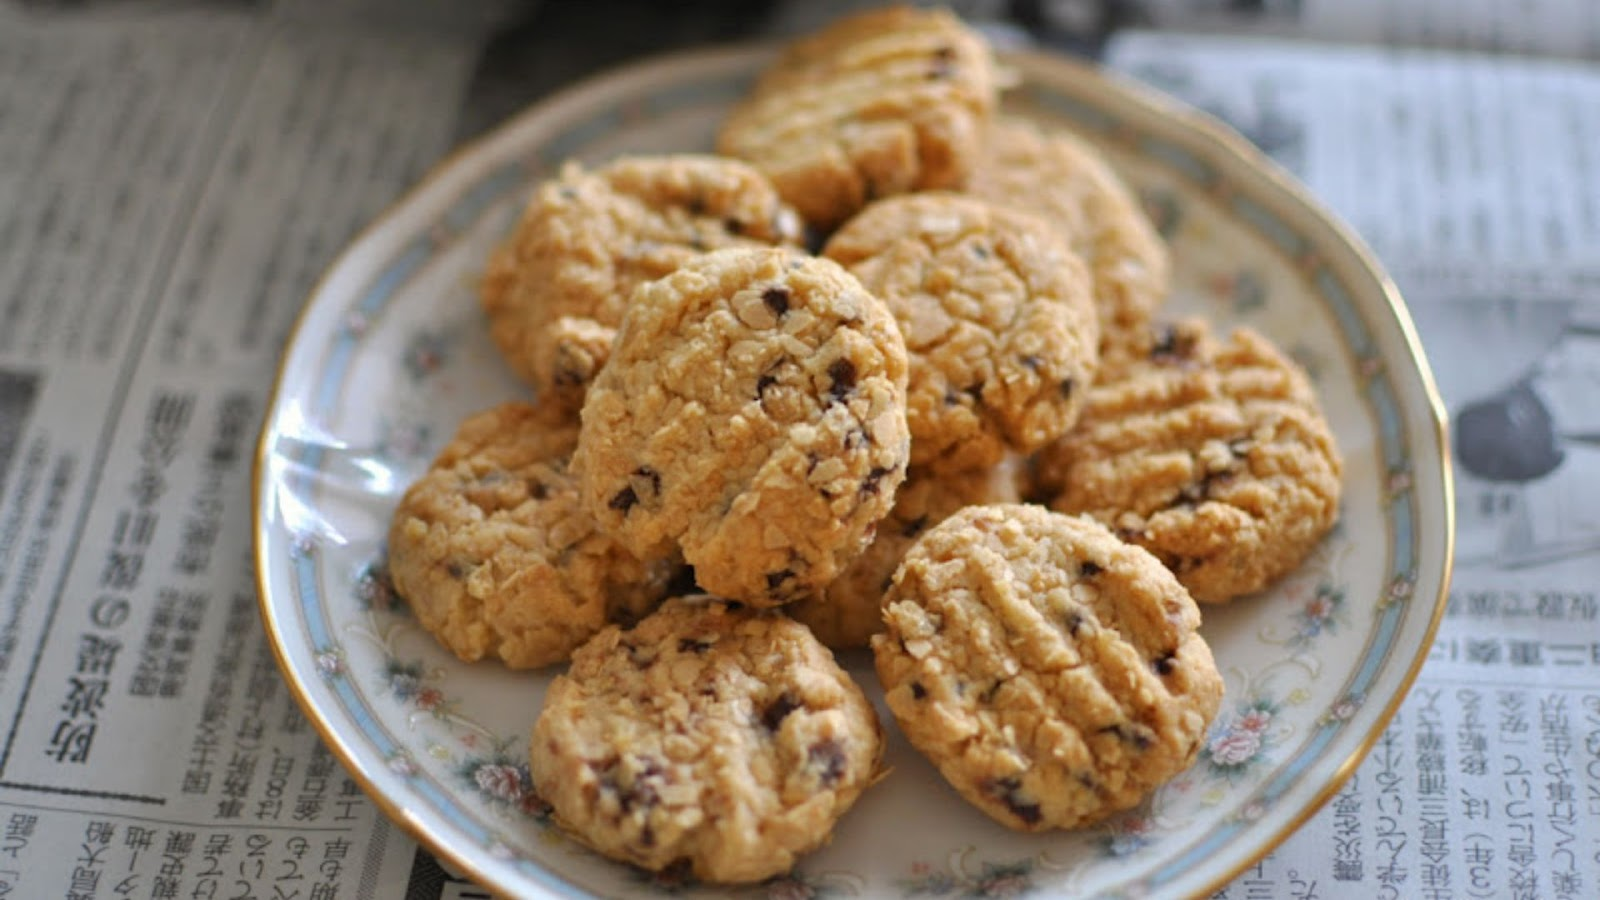 pening kedai biskut raya tak buka   resepi biskut Resepi Biskut Nestum Untuk Bayi Enak dan Mudah